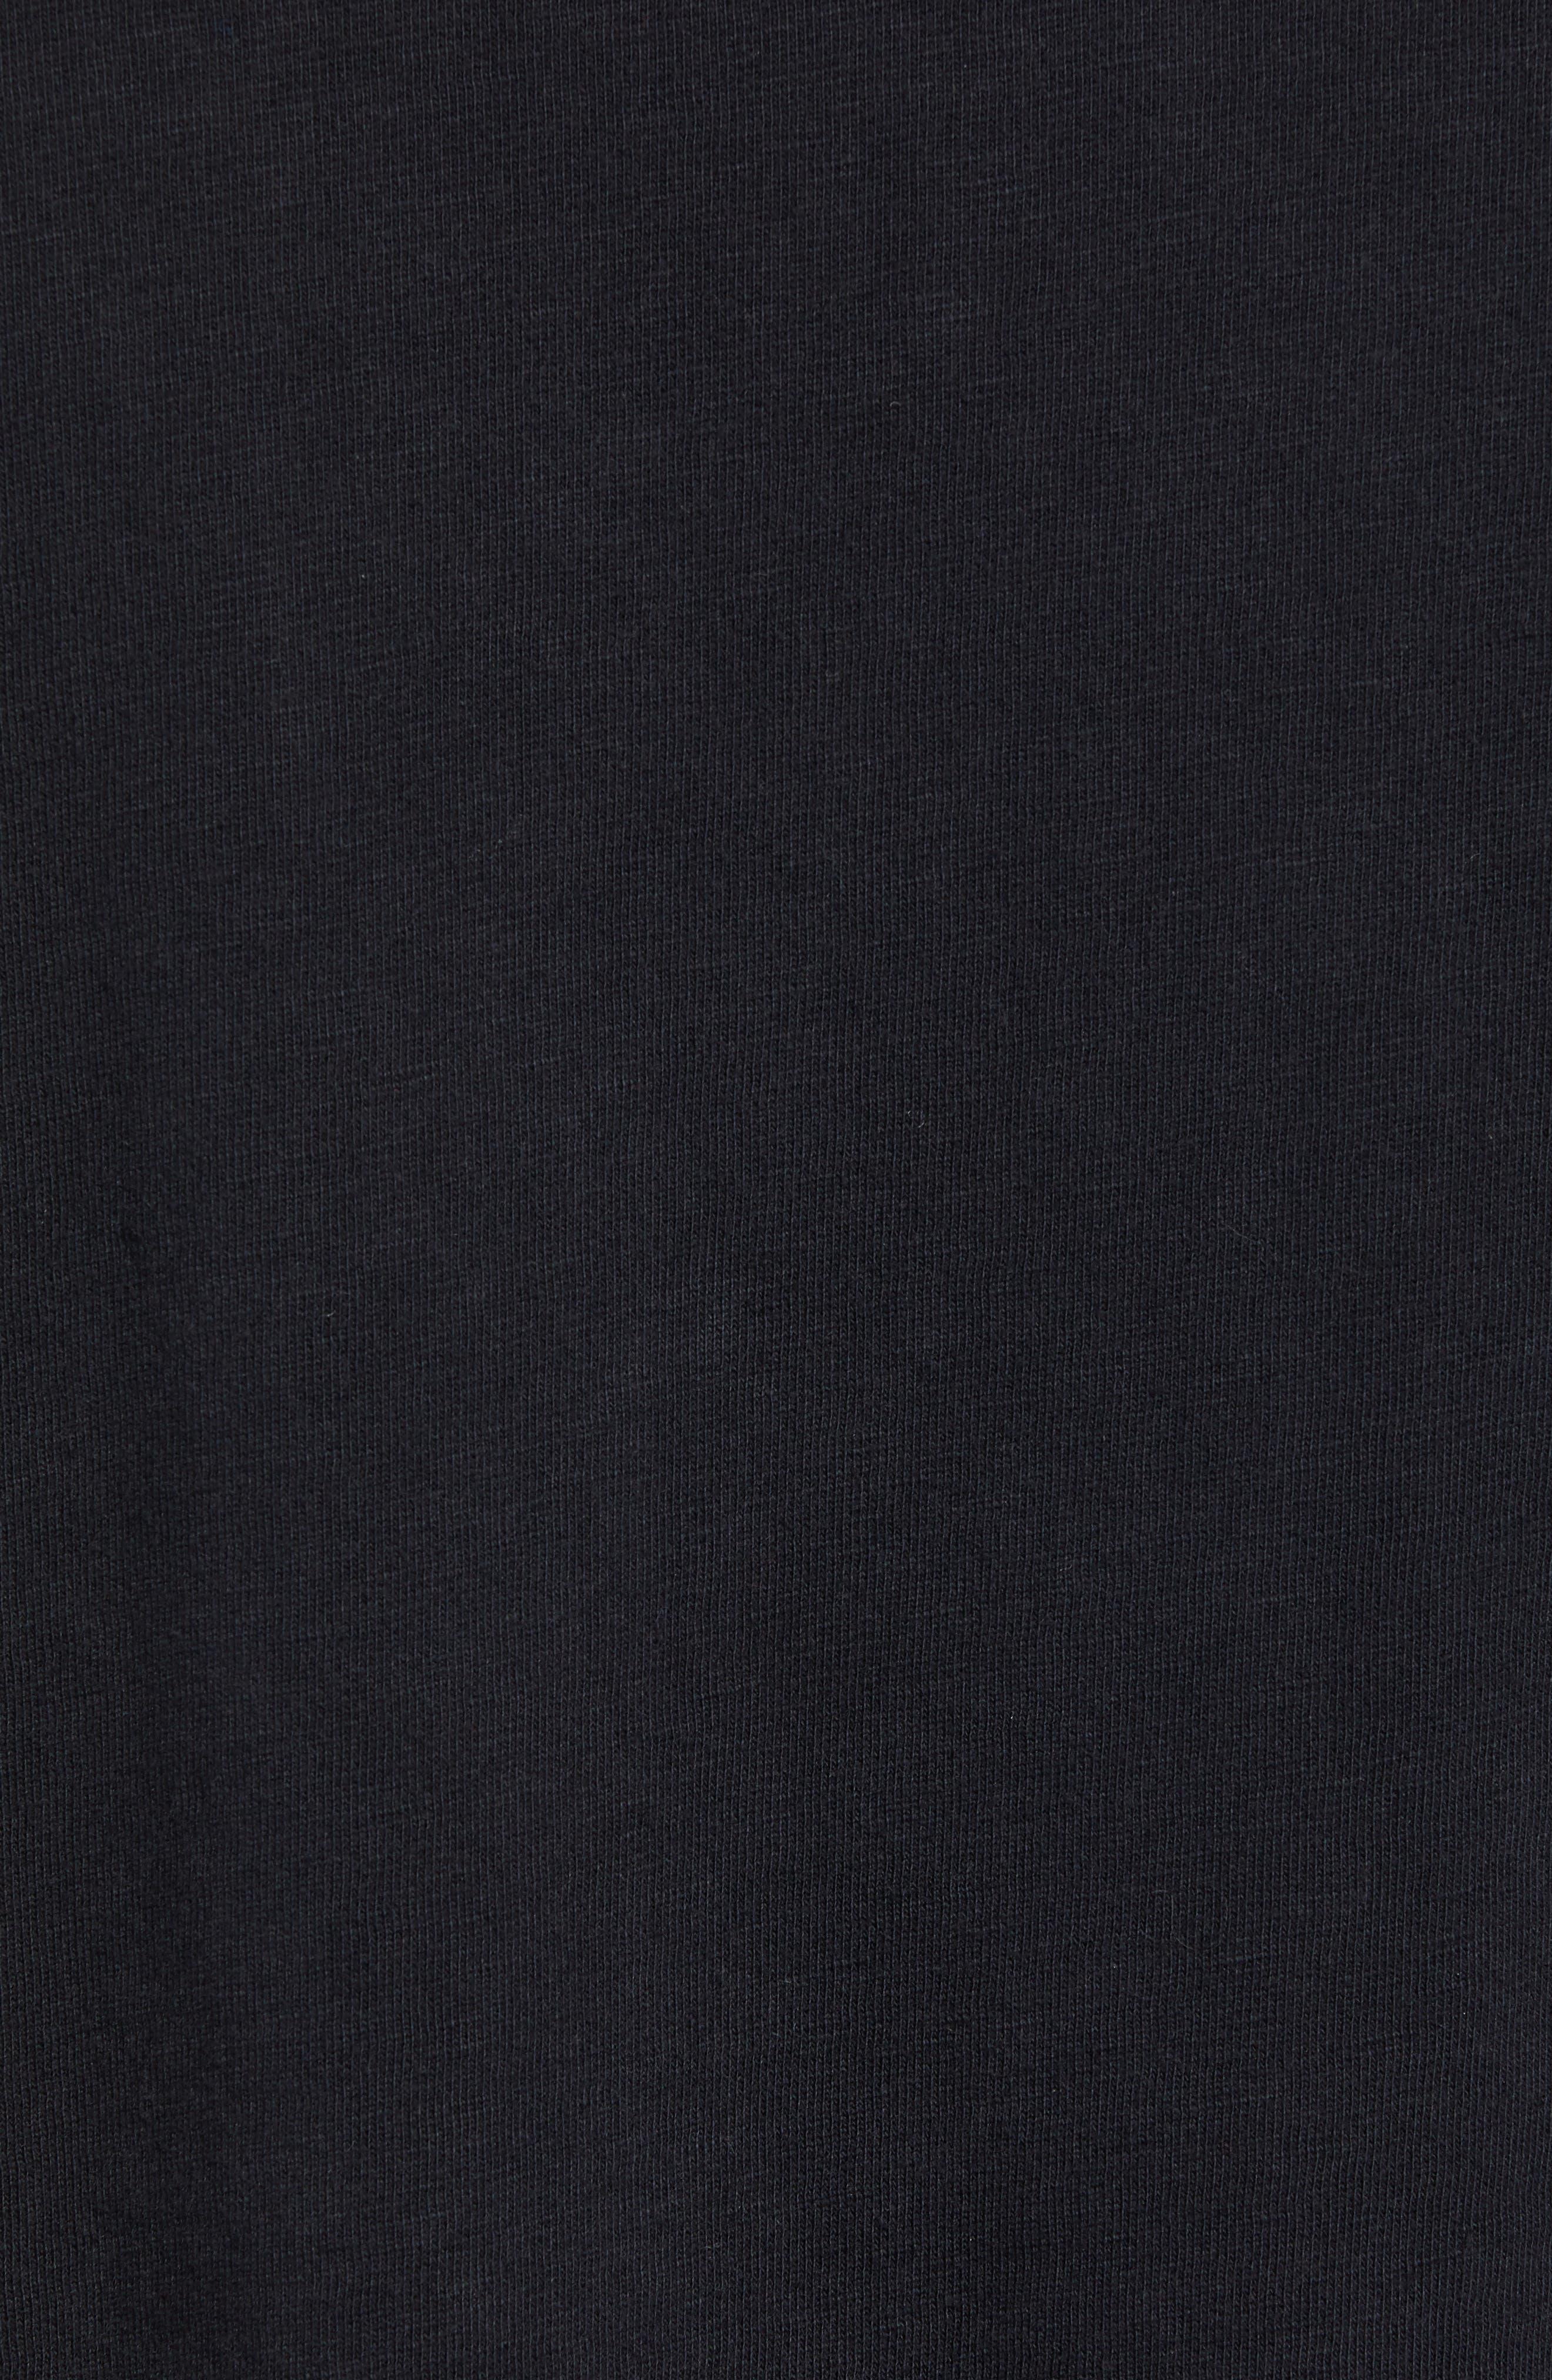 Murphy's Law Graphic T-Shirt,                             Alternate thumbnail 5, color,                             BLACK